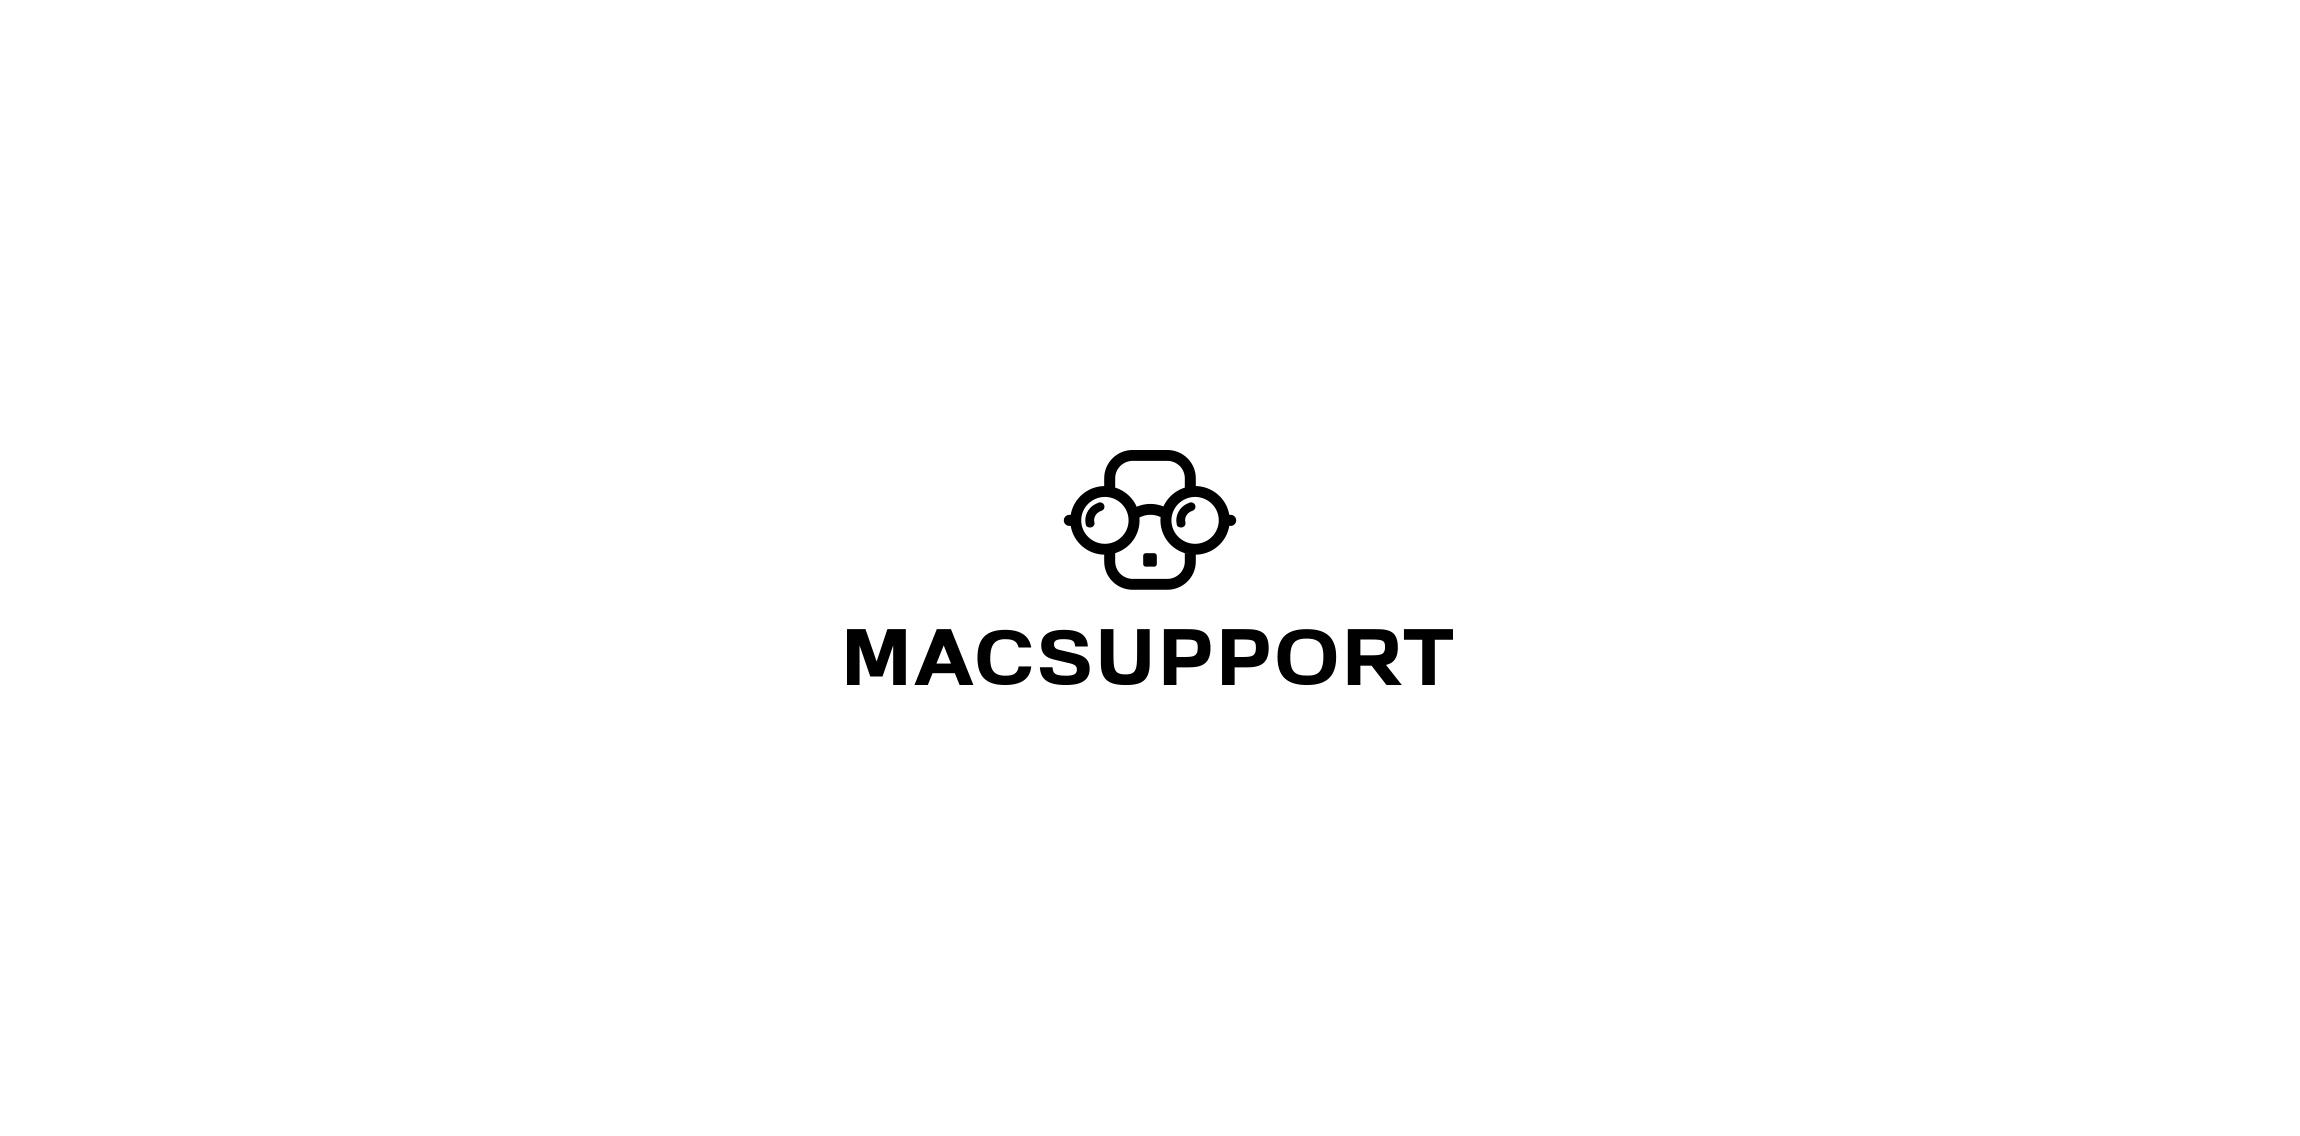 Macsupport